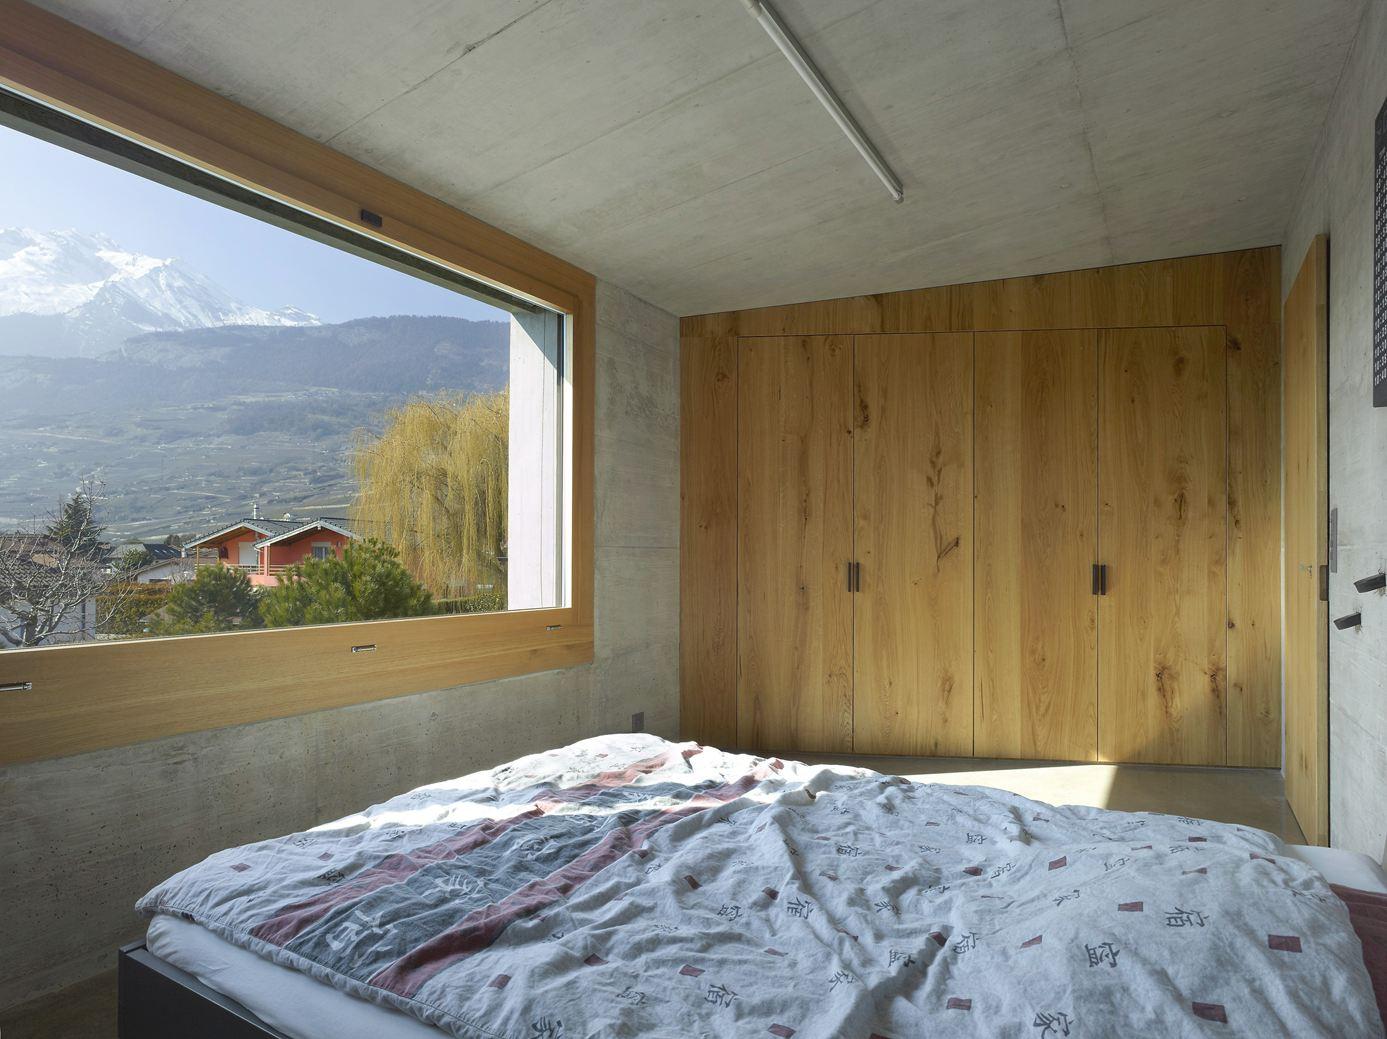 Maison fabrizzi in conthey switzerland by savioz fabrizzi for Interieur kleuren combineren